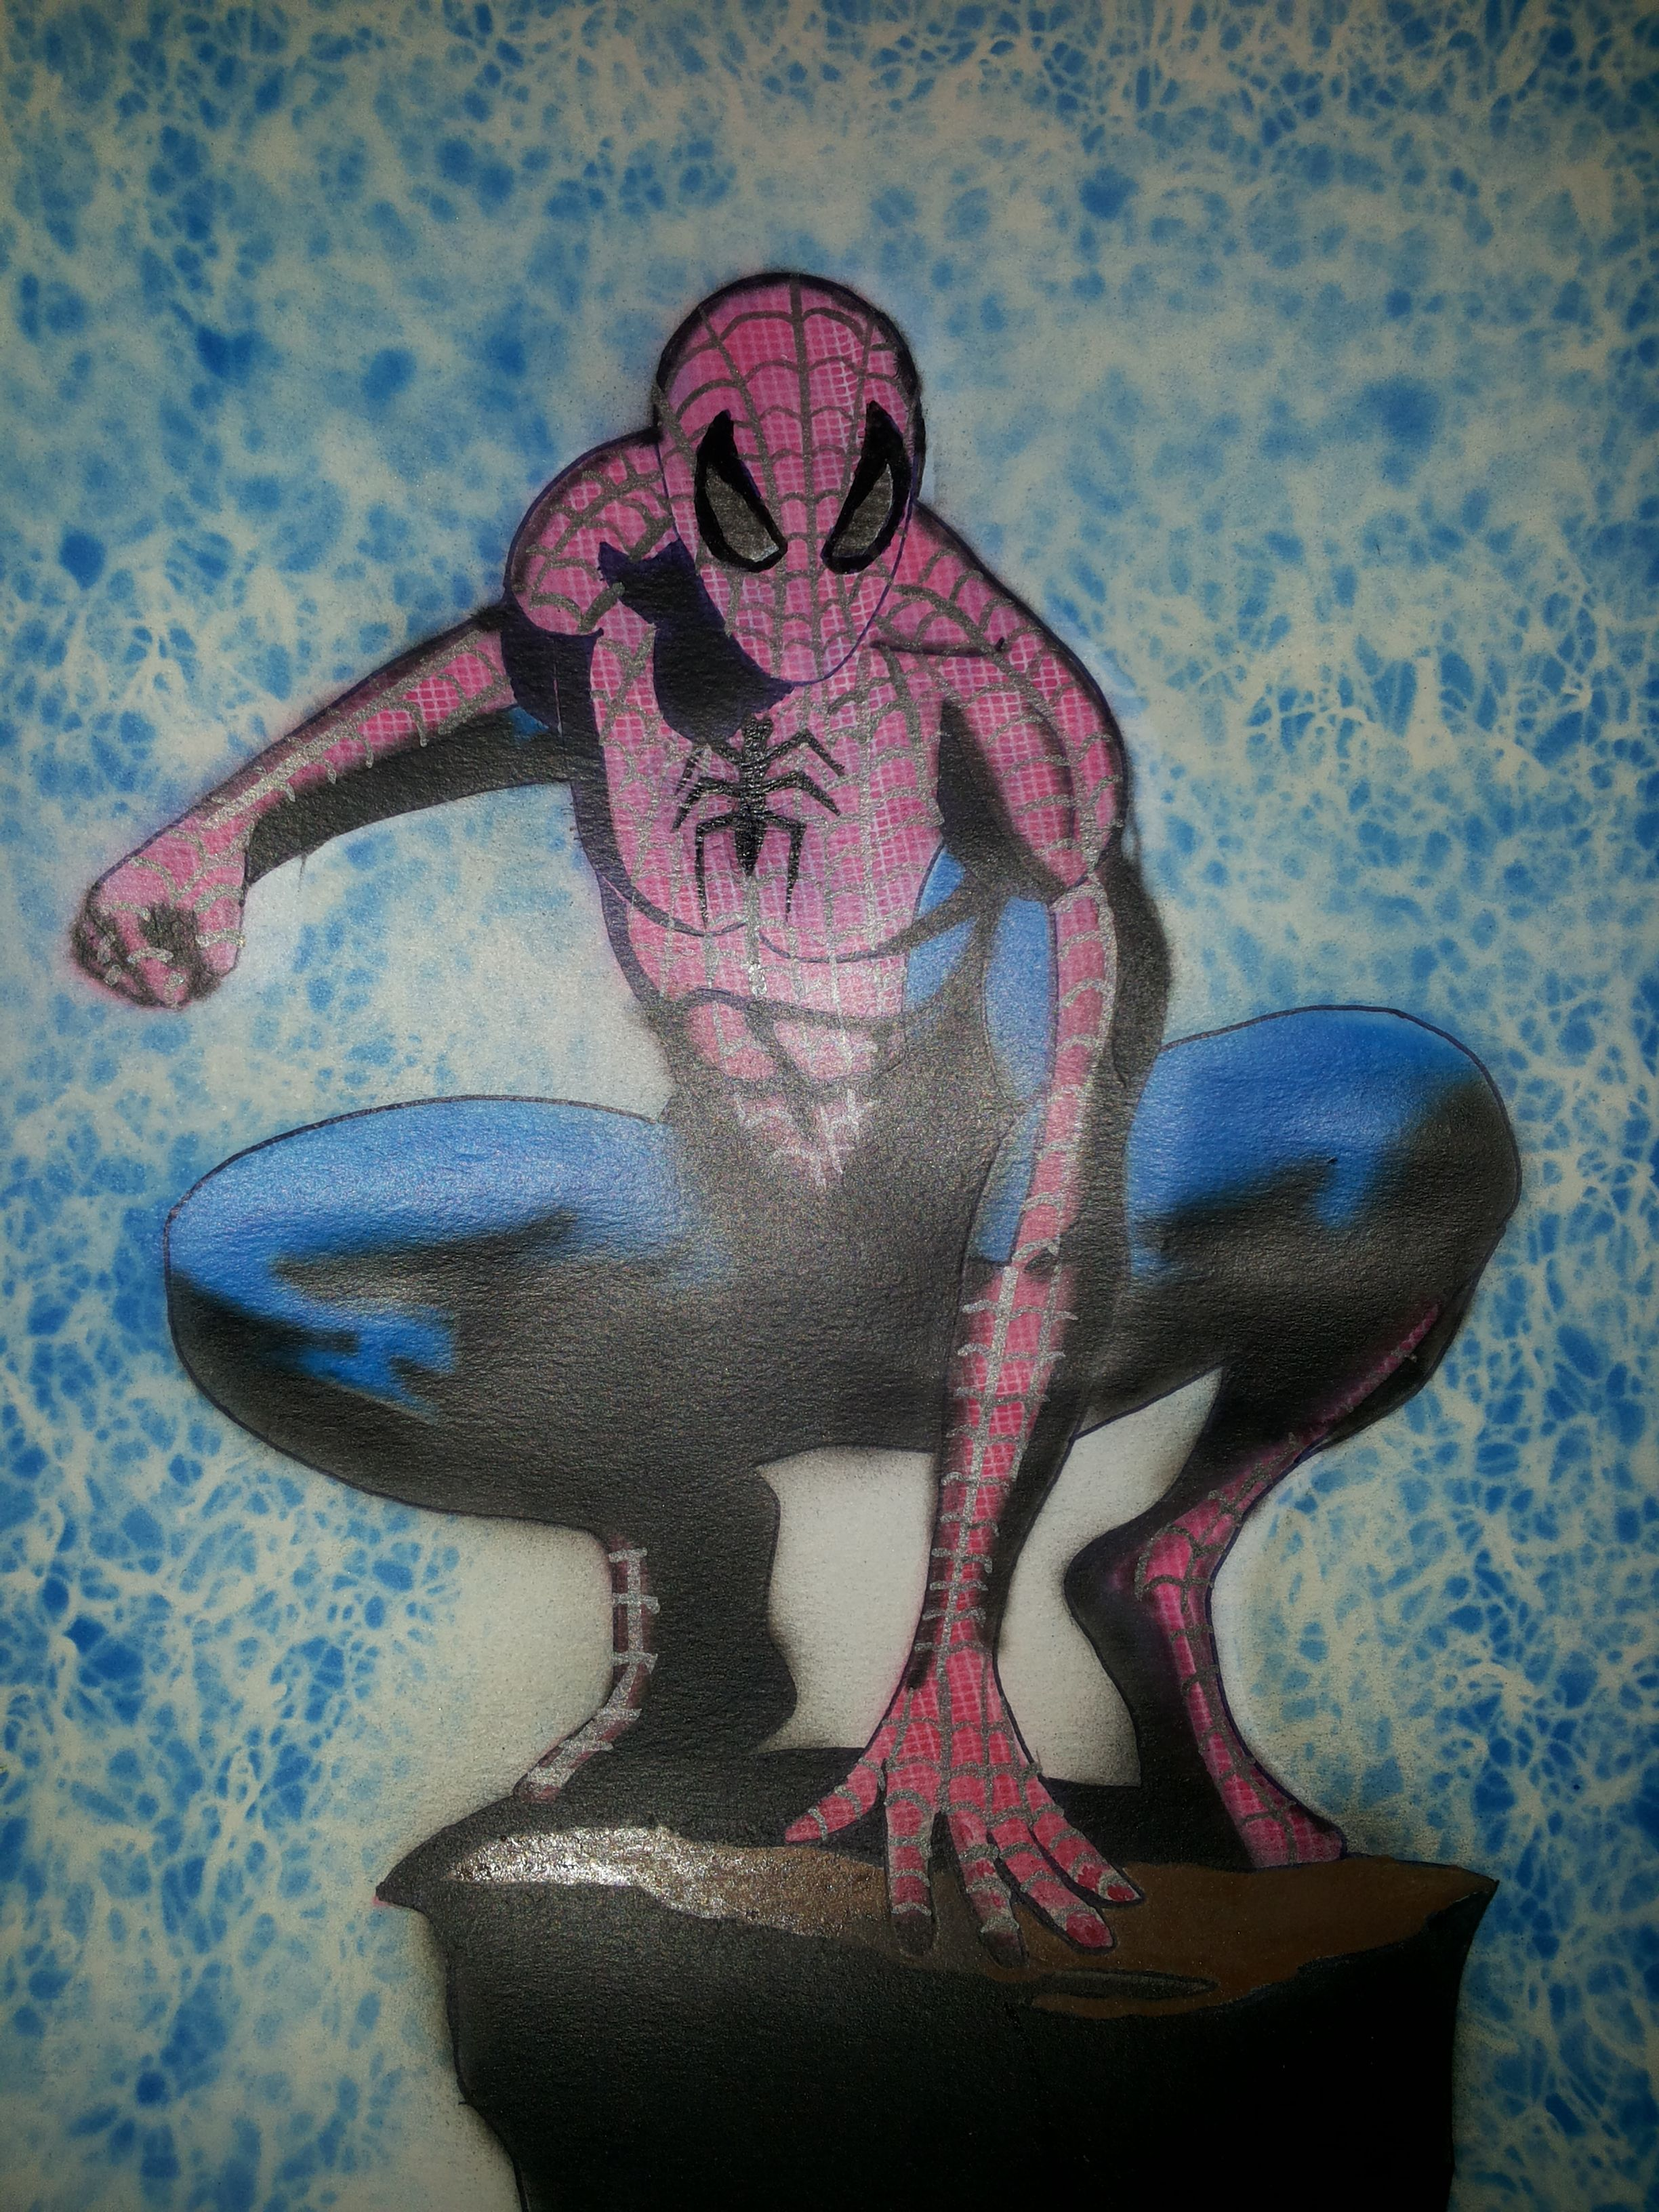 Mattia's spiderman #1